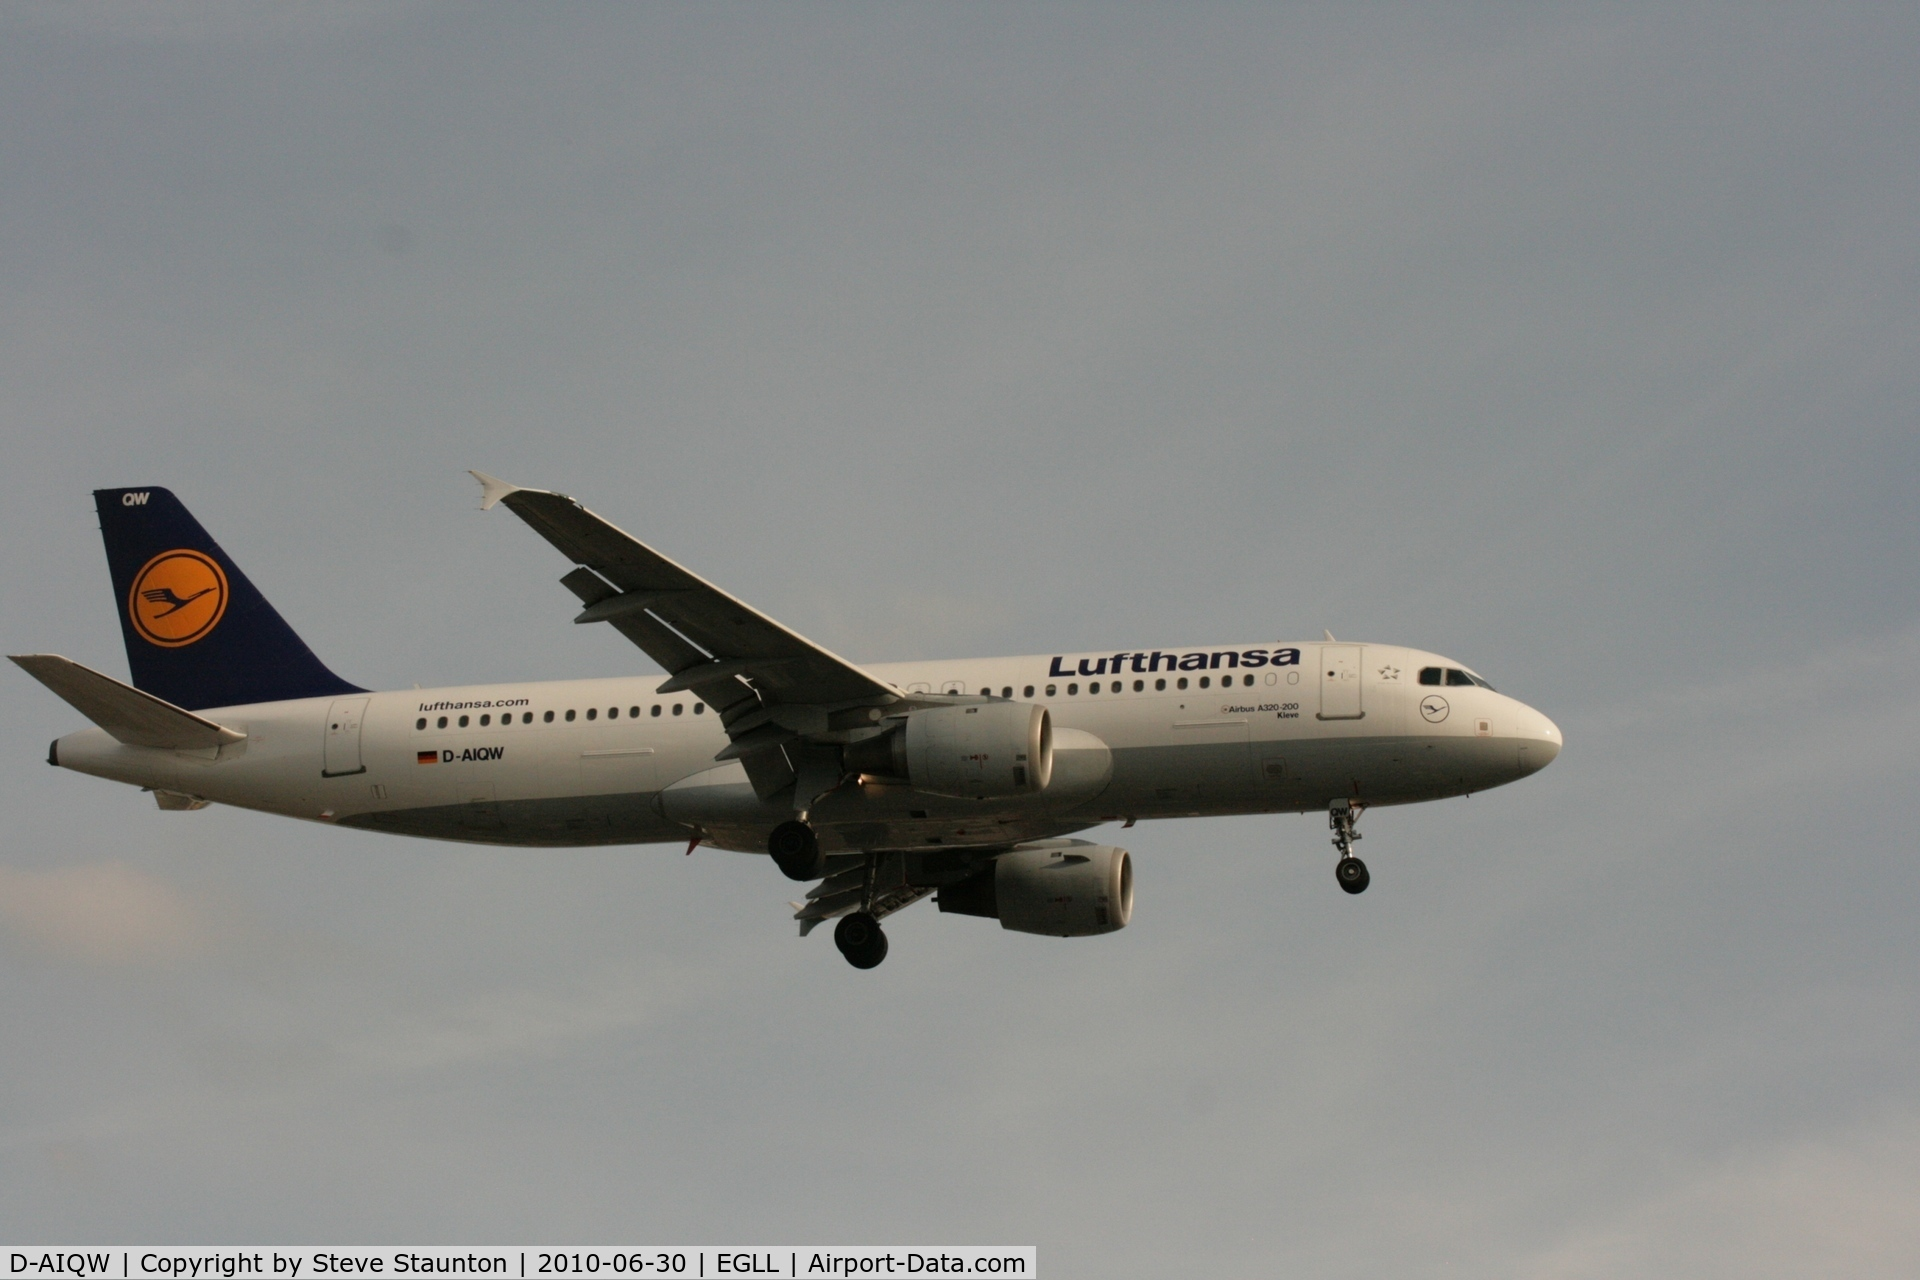 D-AIQW, 2000 Airbus A320-211 C/N 1367, Taken at Heathrow Airport, June 2010